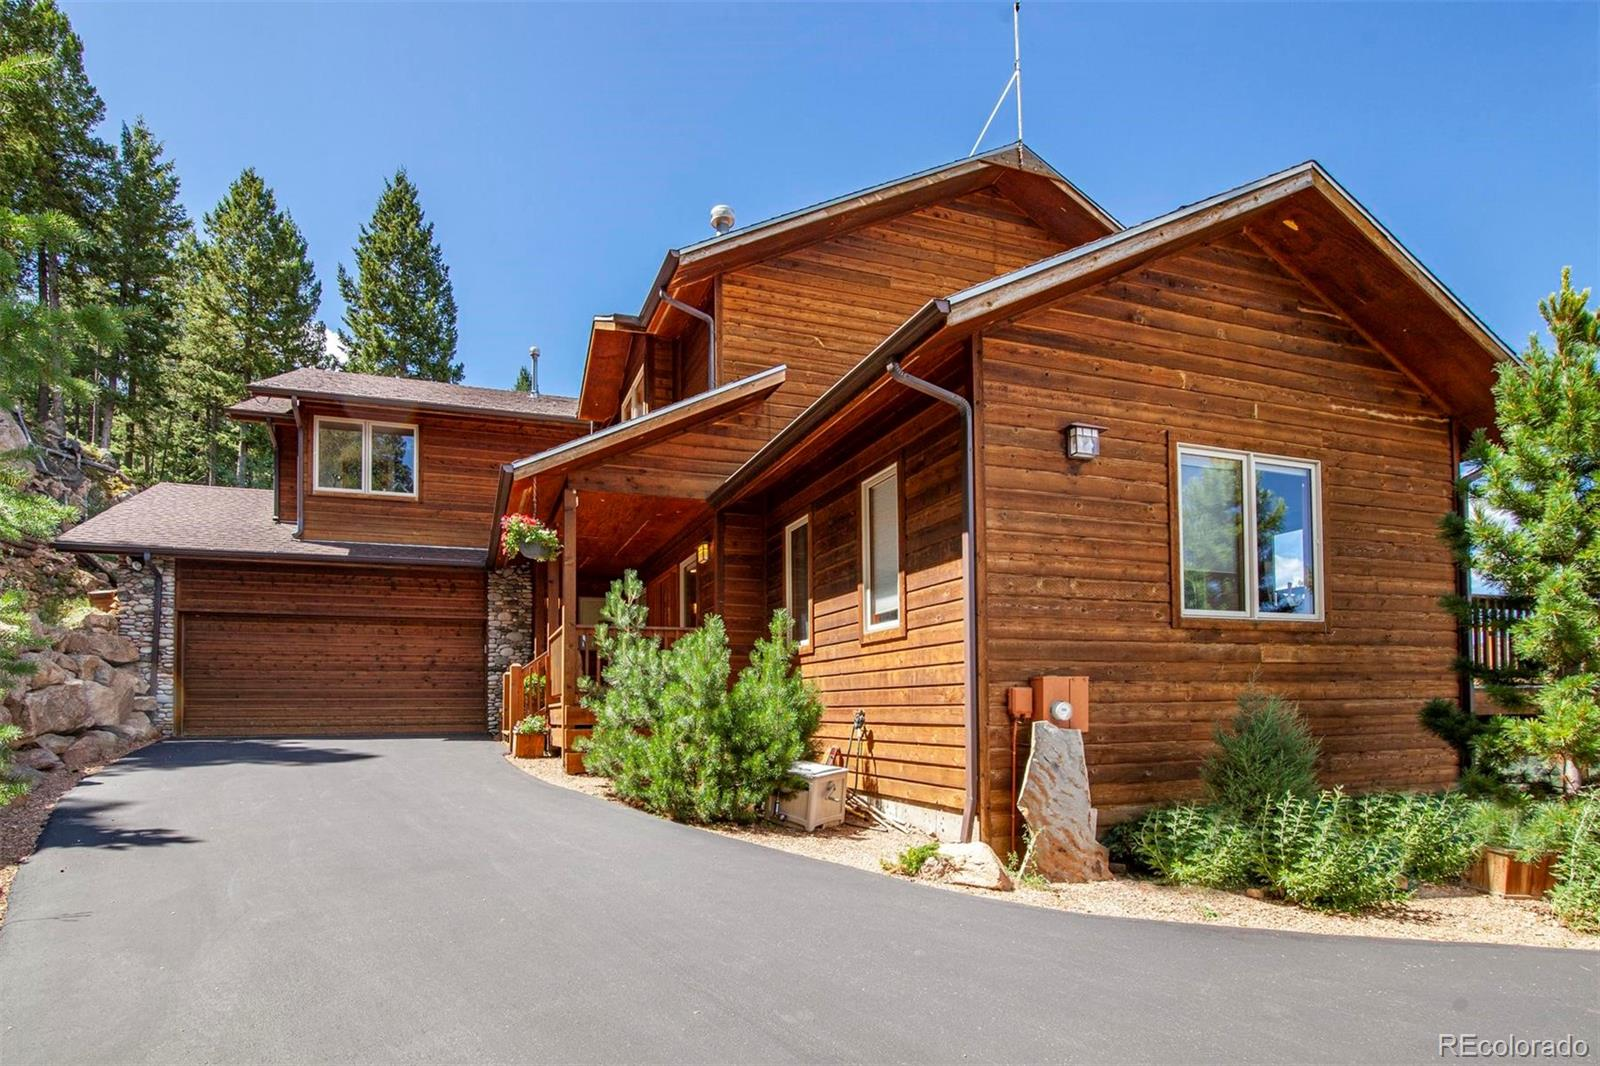 6837 Berry Bush Lane, Evergreen, CO 80439 - Evergreen, CO real estate listing